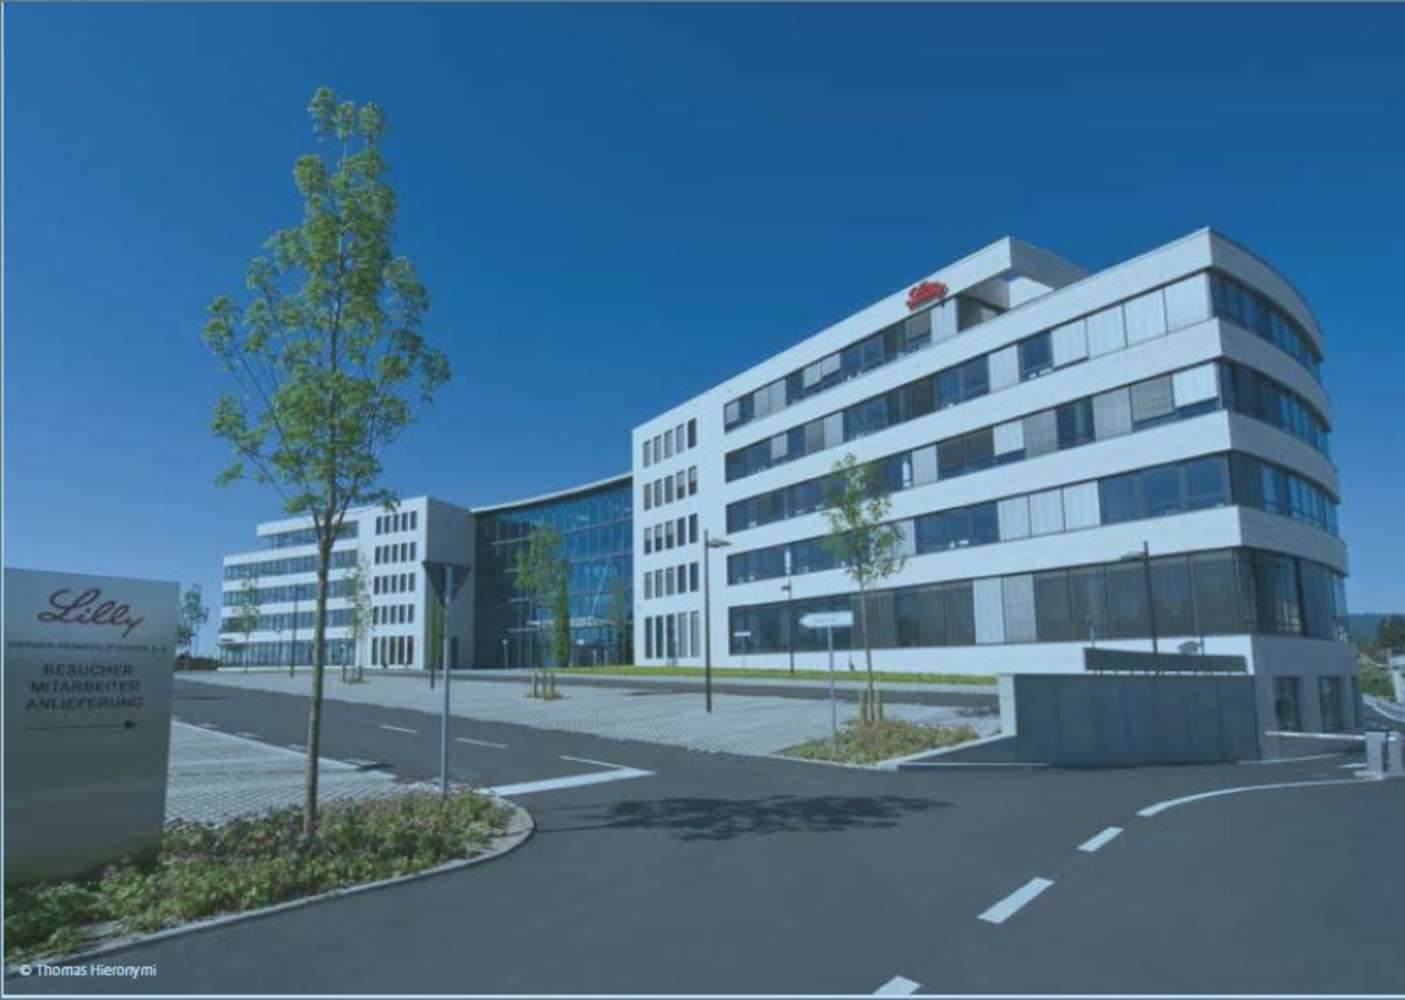 Büros Bad homburg, 61352 - Büro - Bad Homburg - F1859 - 9917276